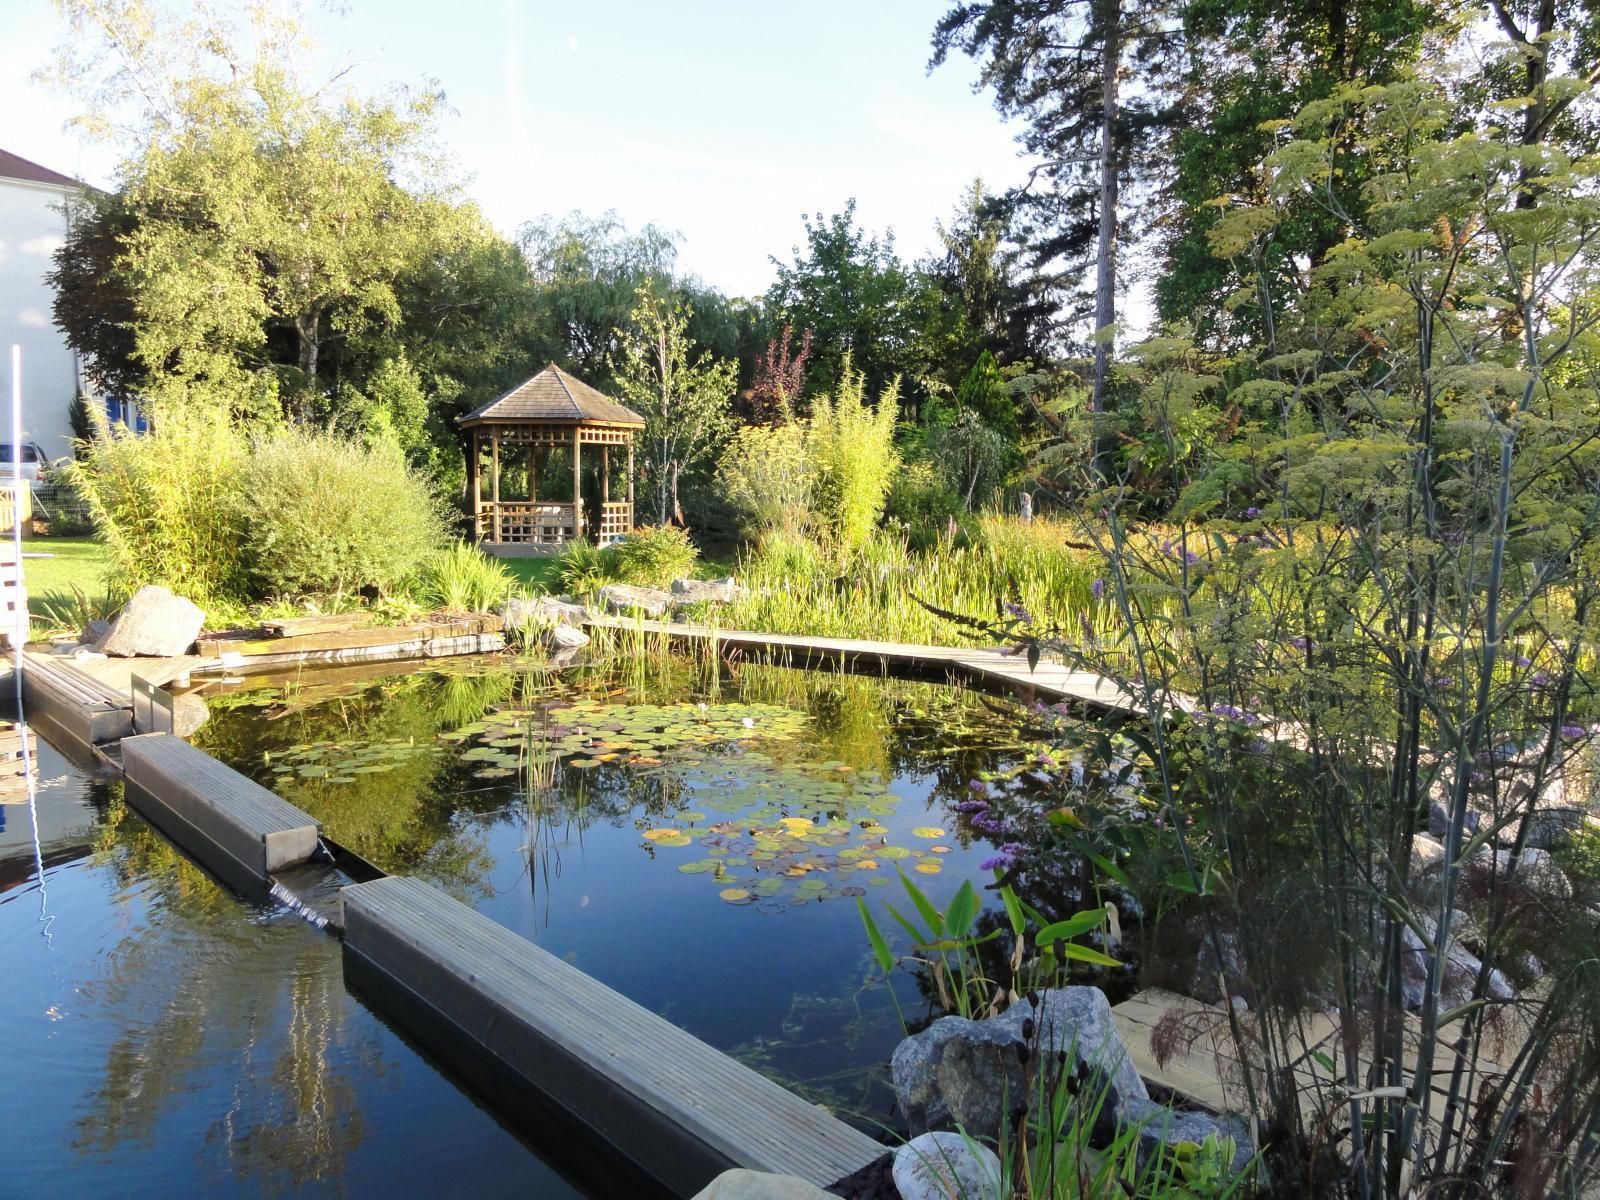 bassin de baignade naturelle